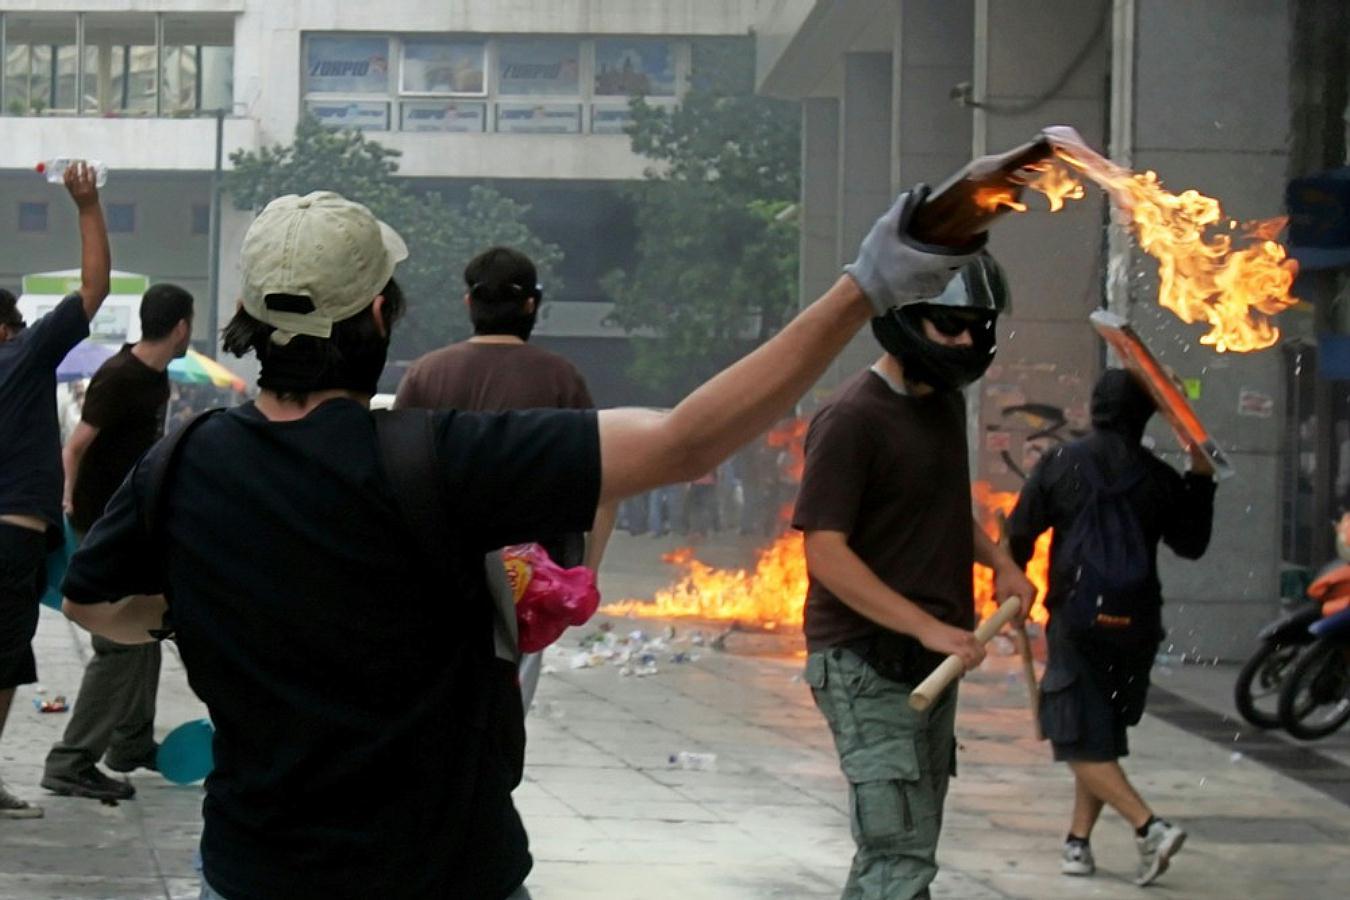 Jornadas de protesta Grecia 2011. Pict7